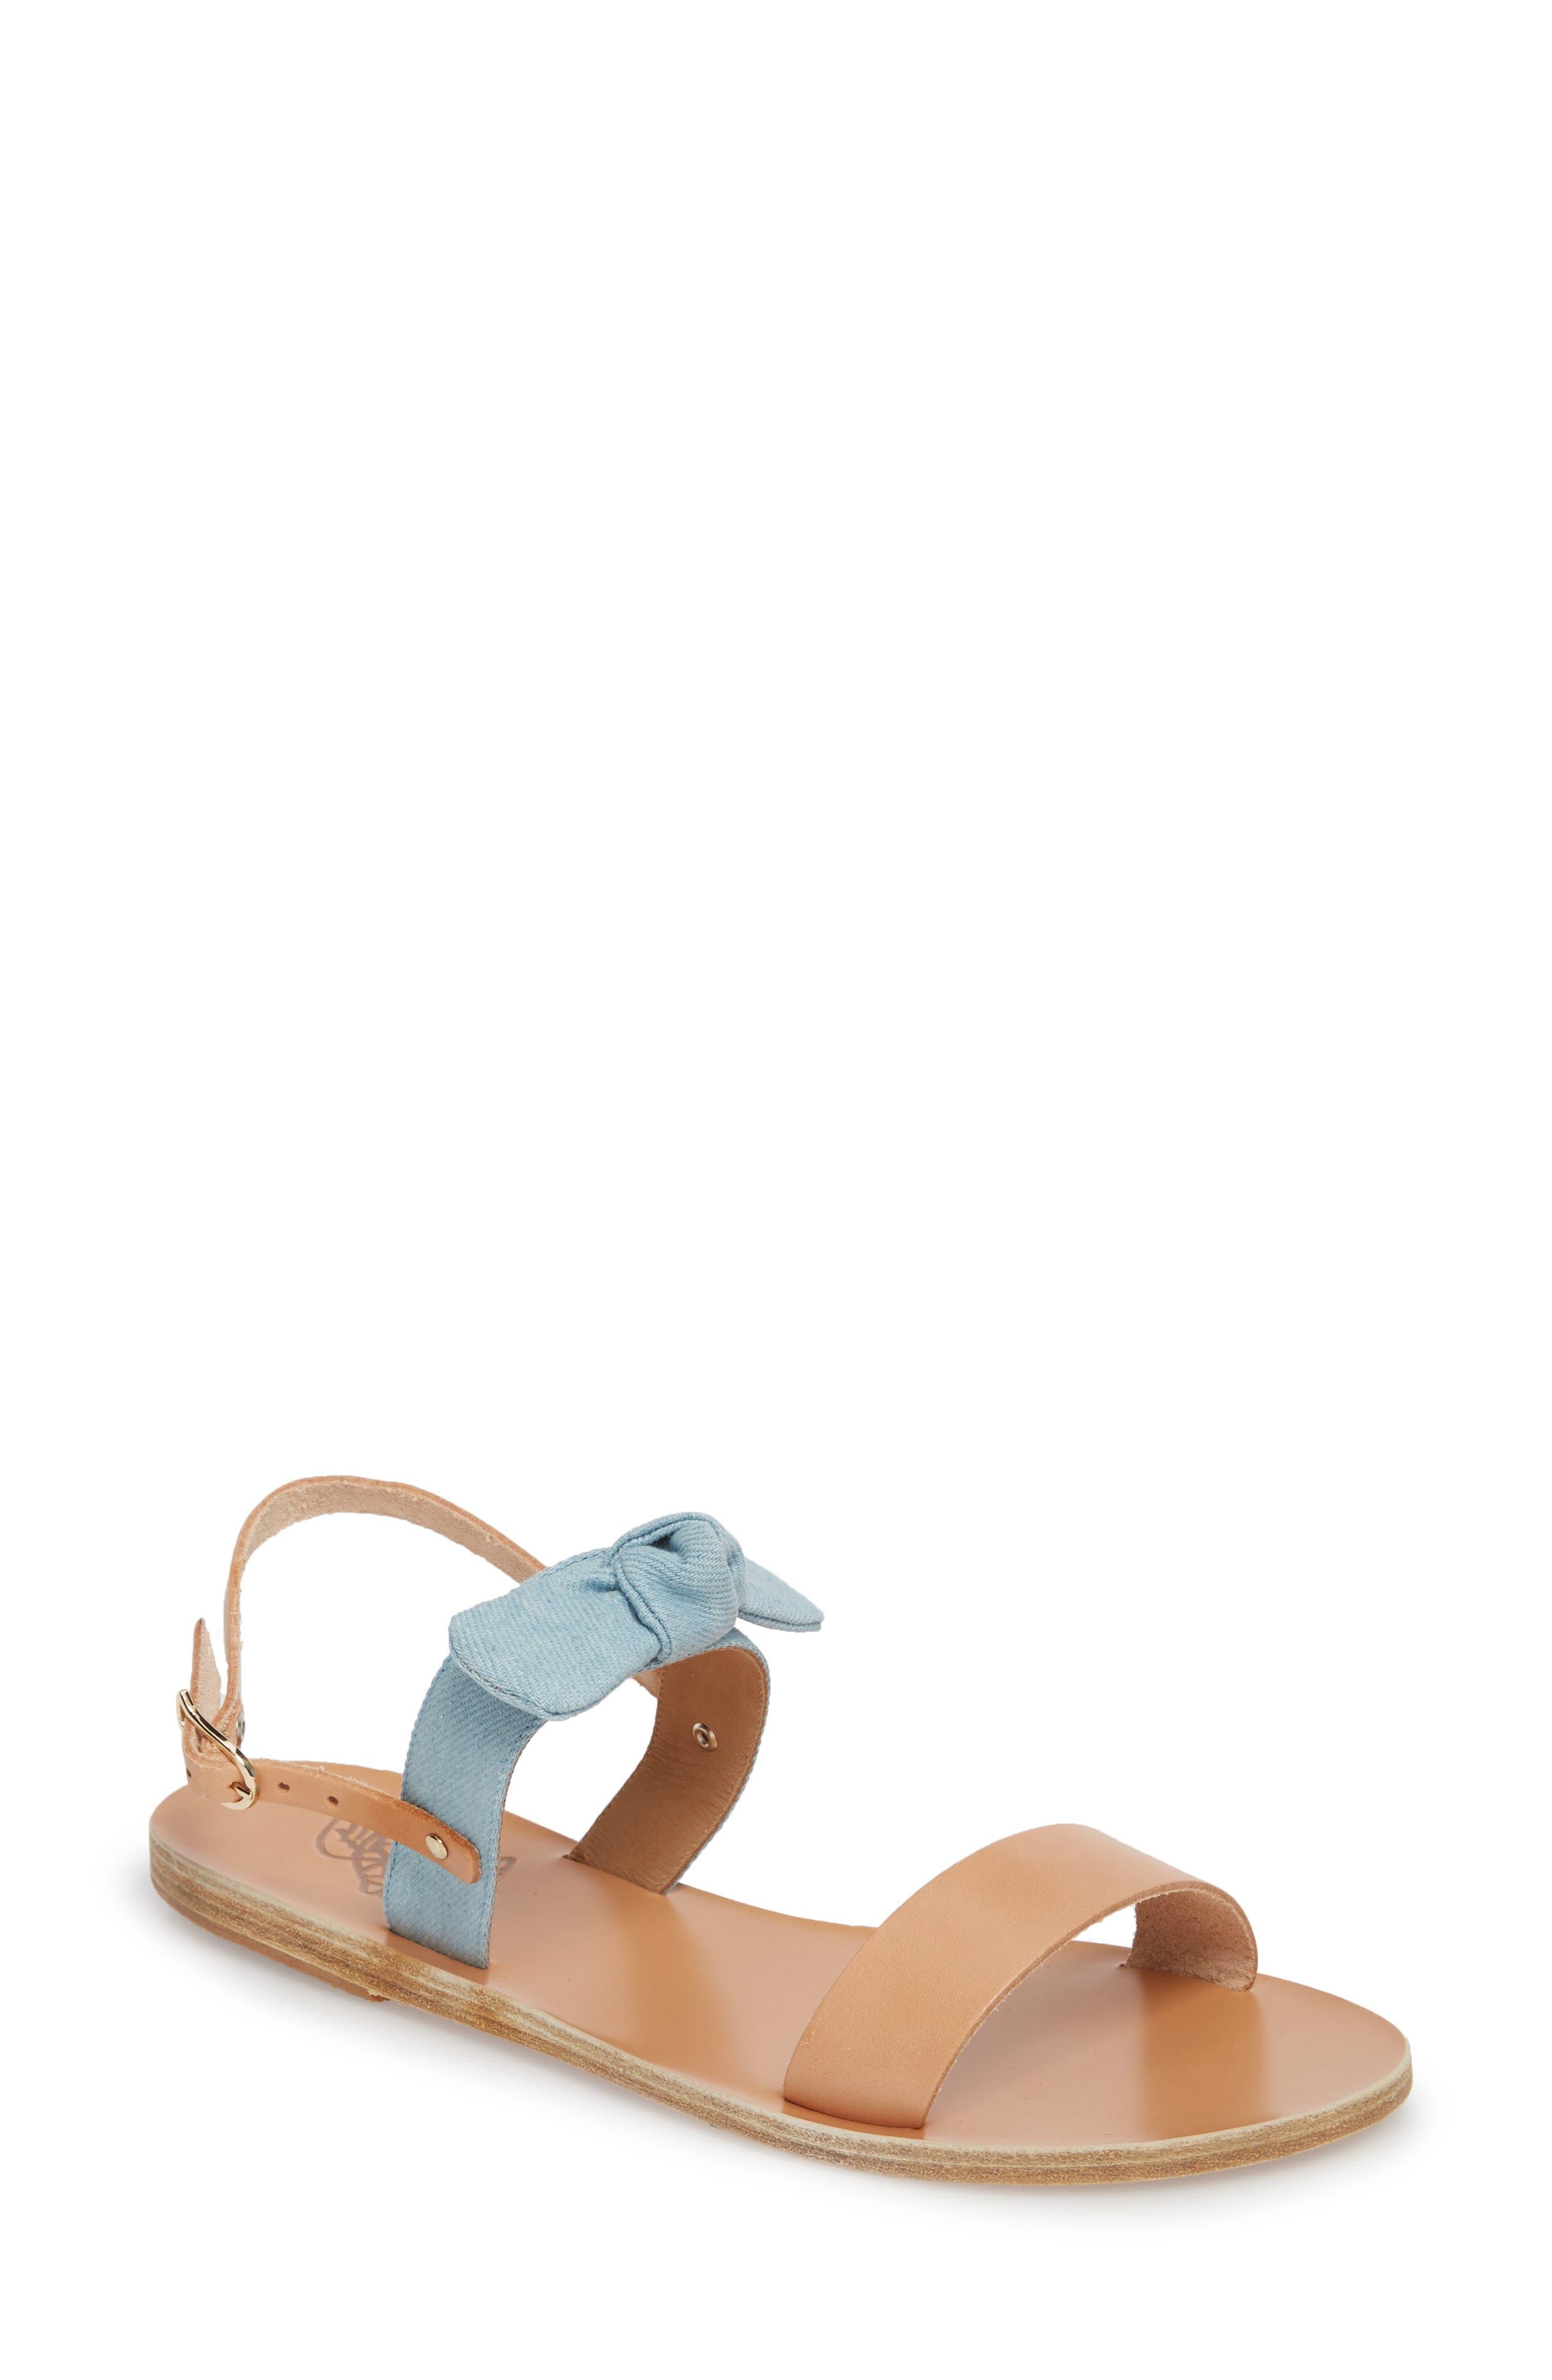 Alternate Image 1 Selected - Ancient Greek Sandals Clio Bow Sandal (Women)